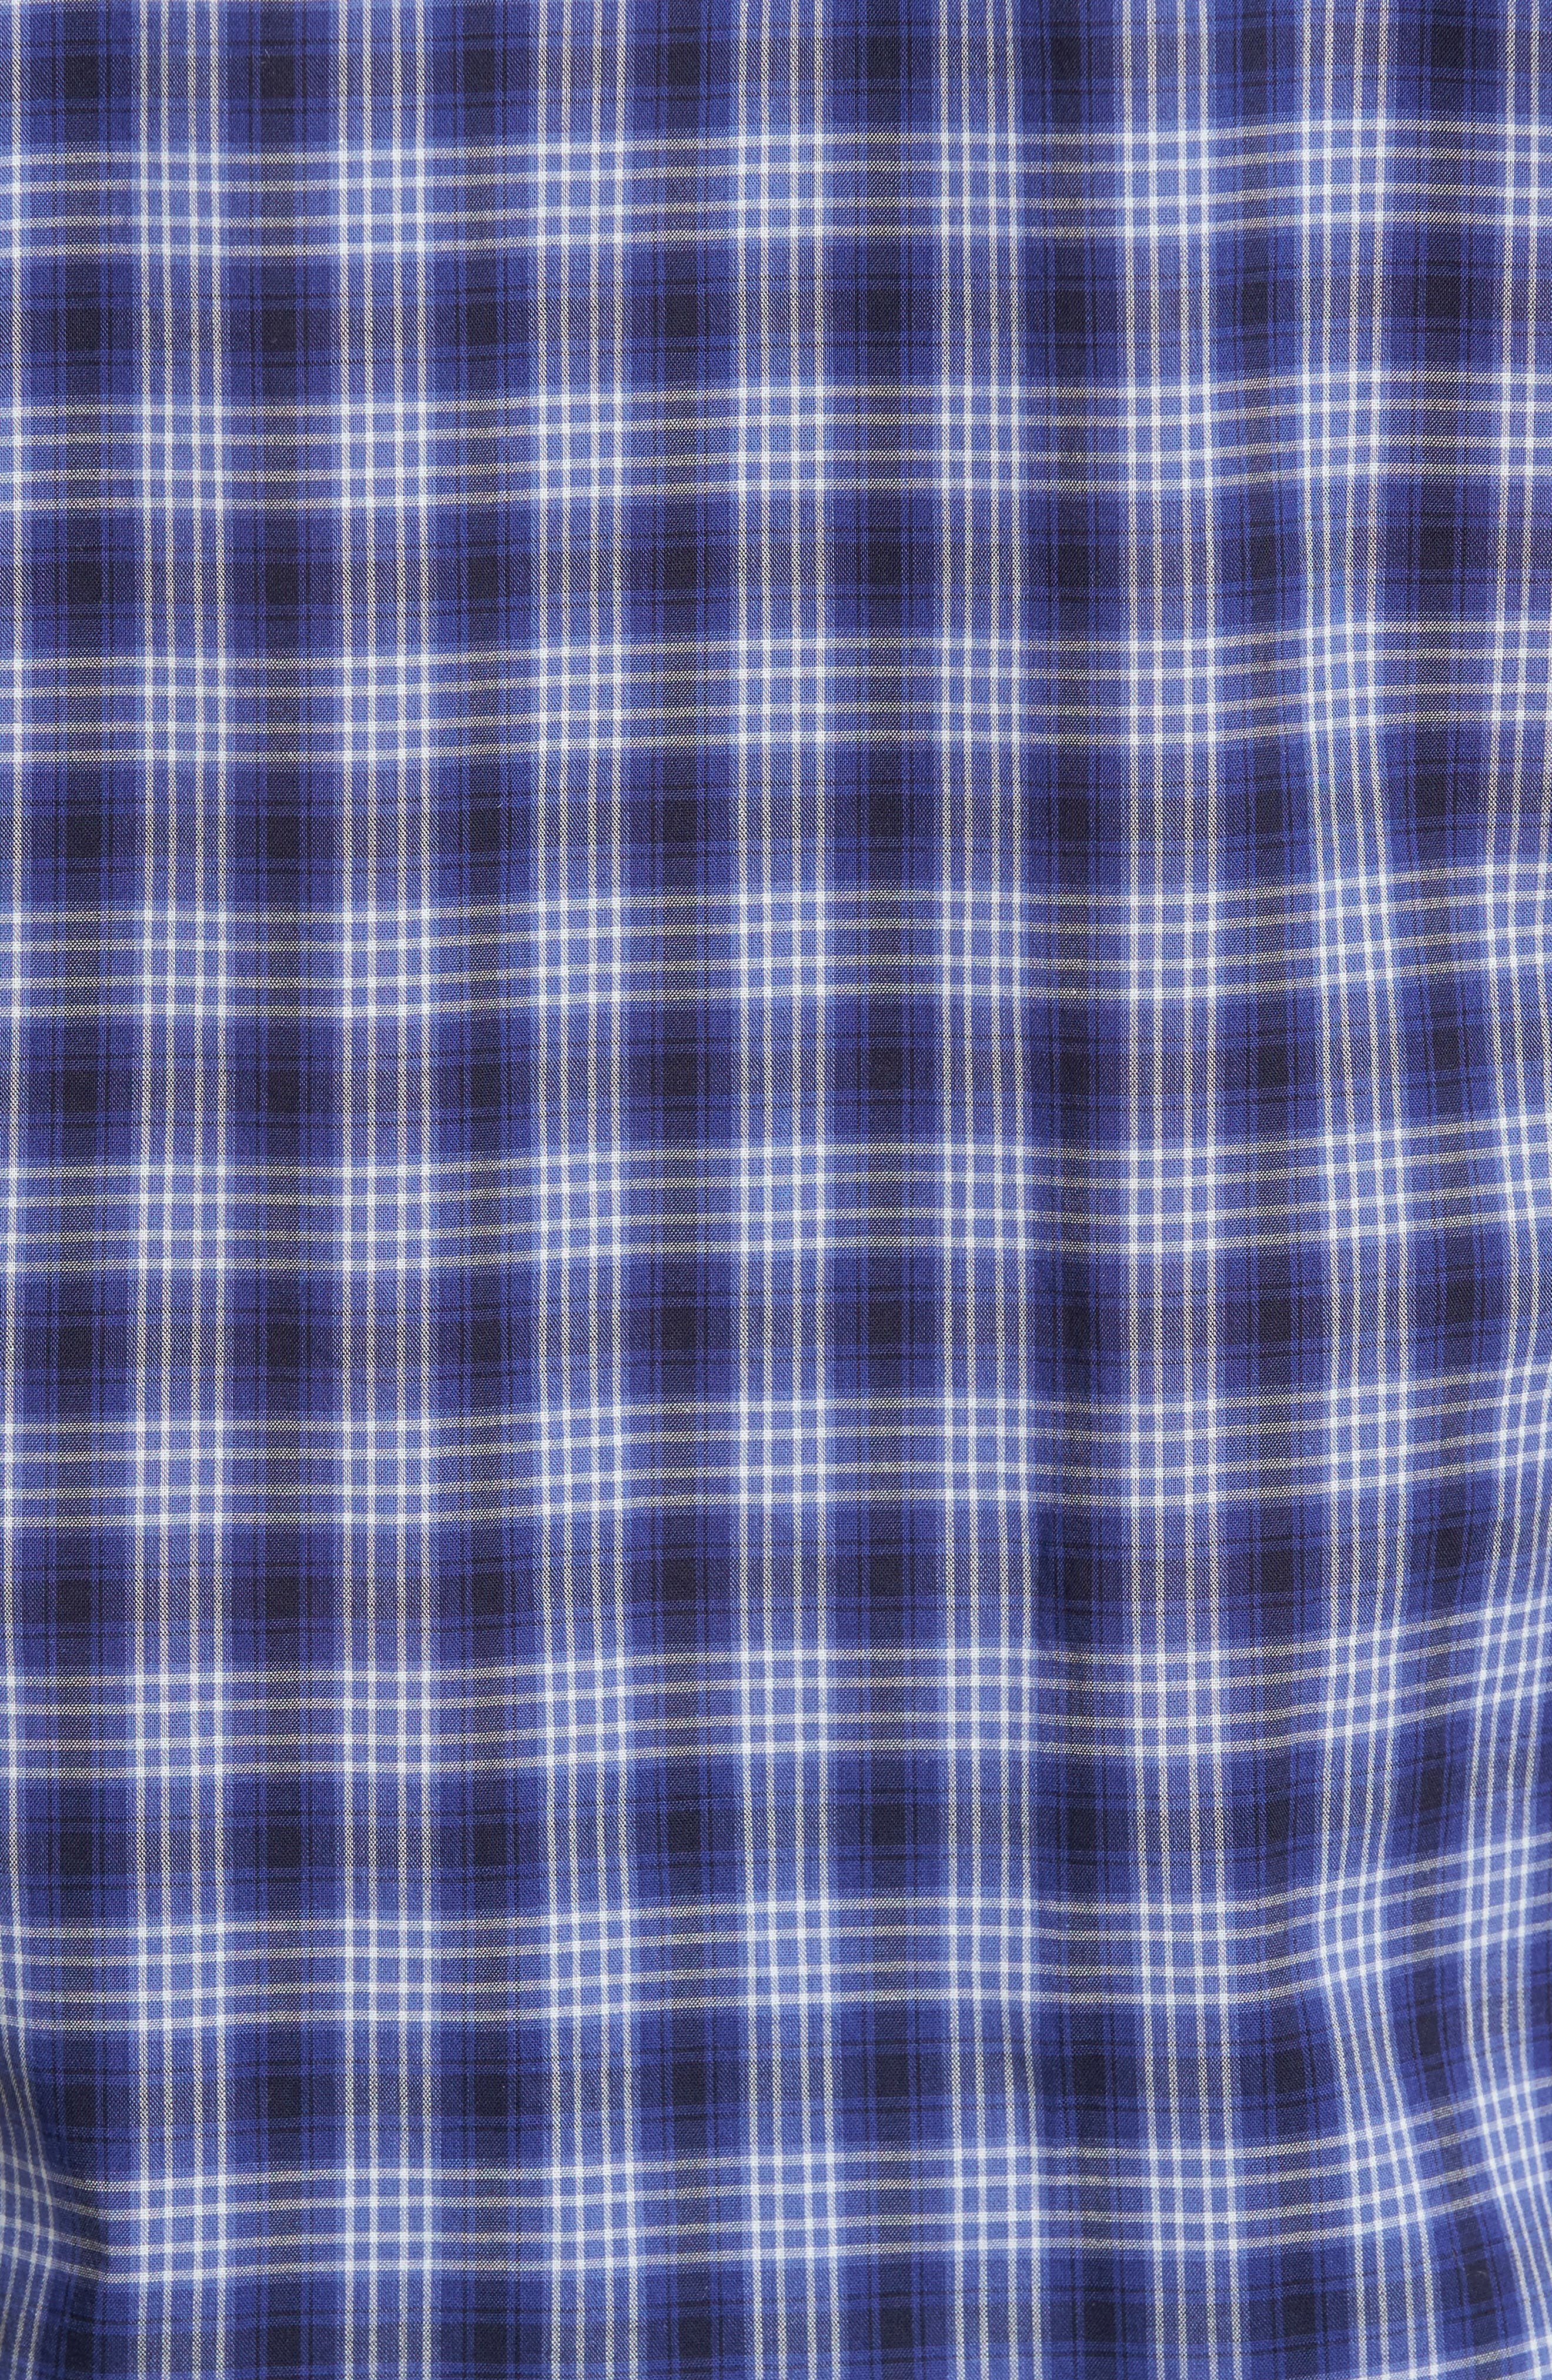 Medina Slim Fit Plaid Sport Shirt,                             Alternate thumbnail 5, color,                             Pacific